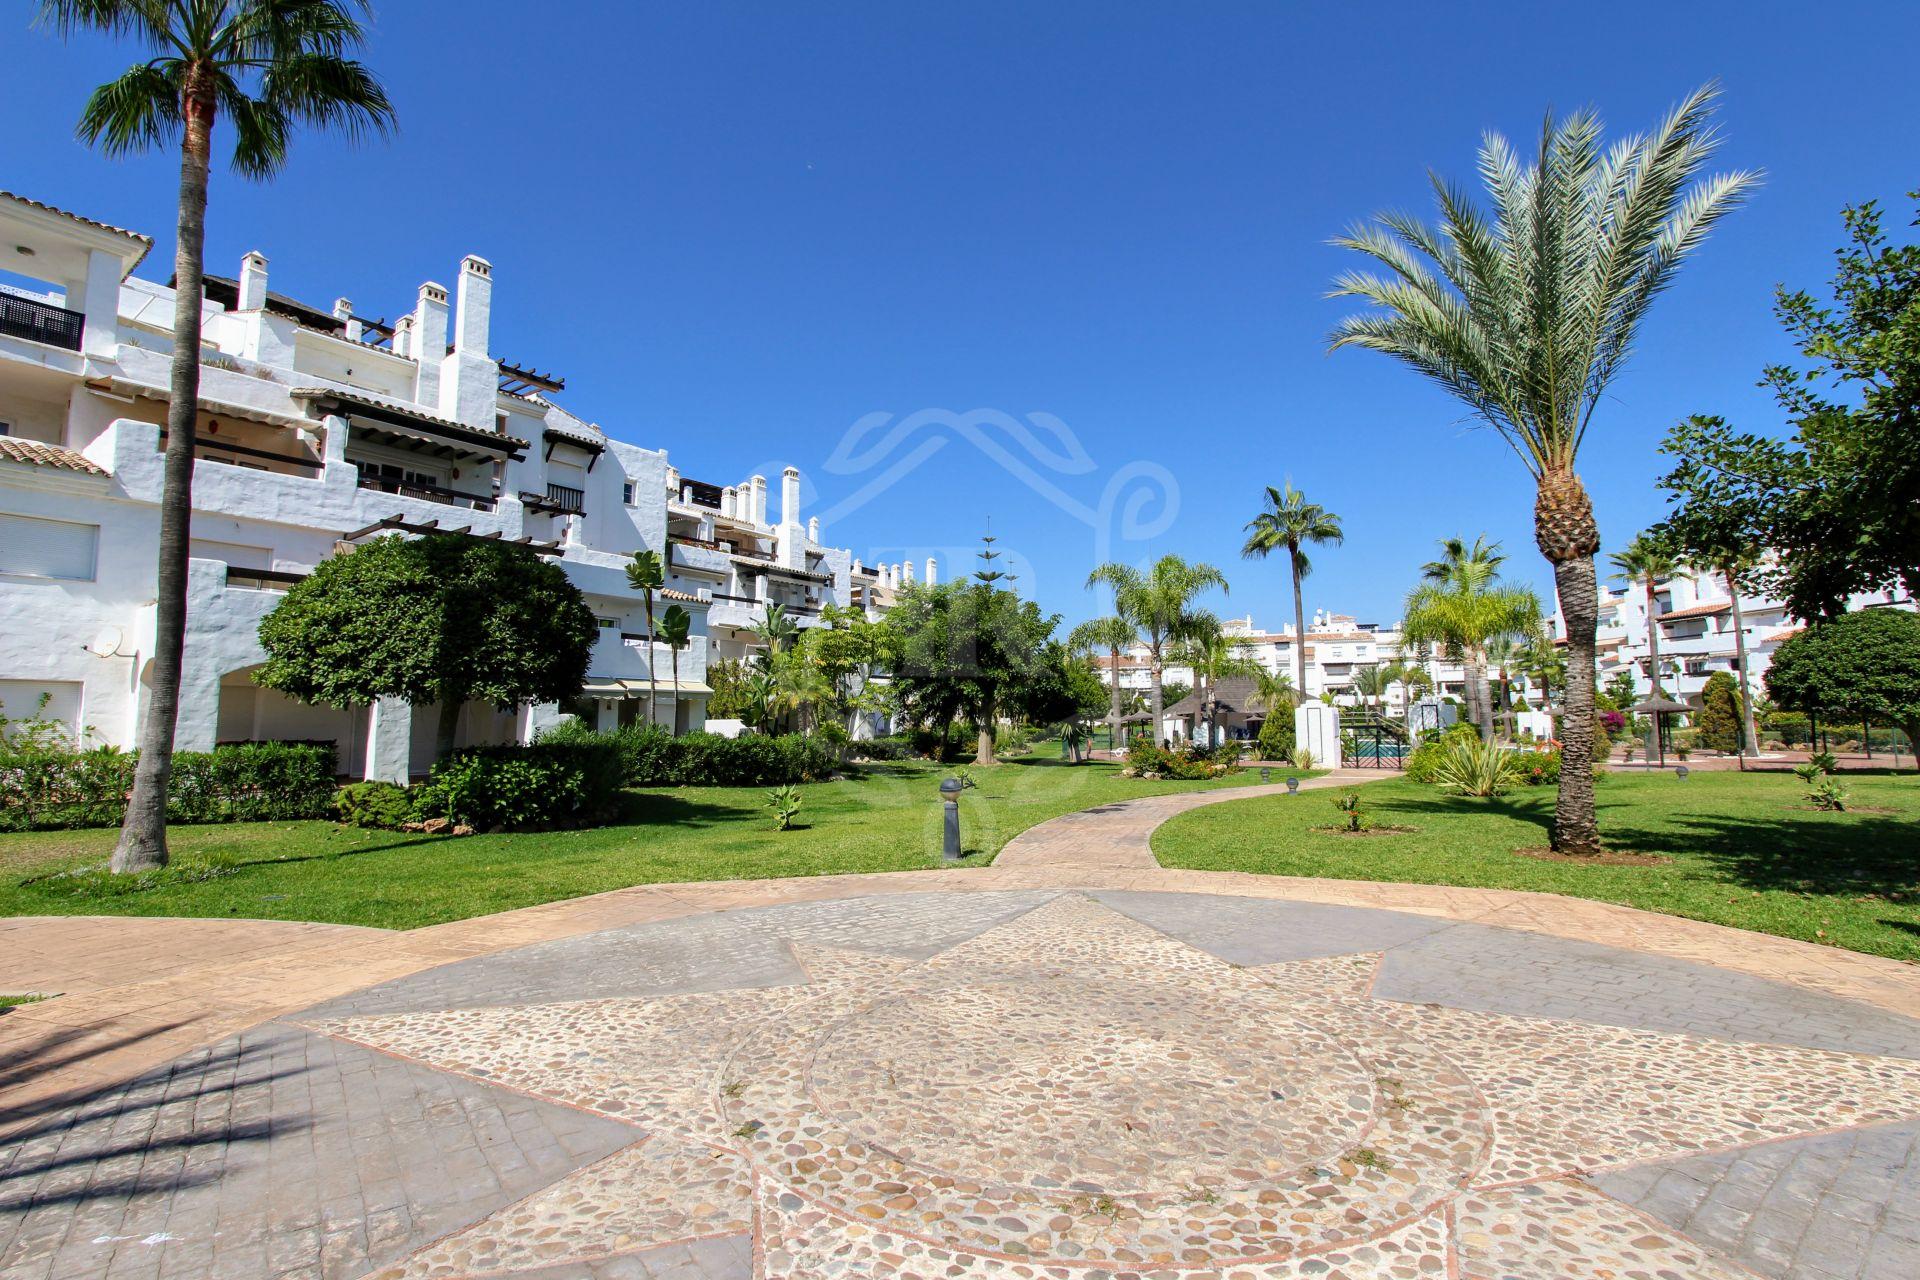 Apartment for sale in Las Adelfas, San Pedro de Alcantara